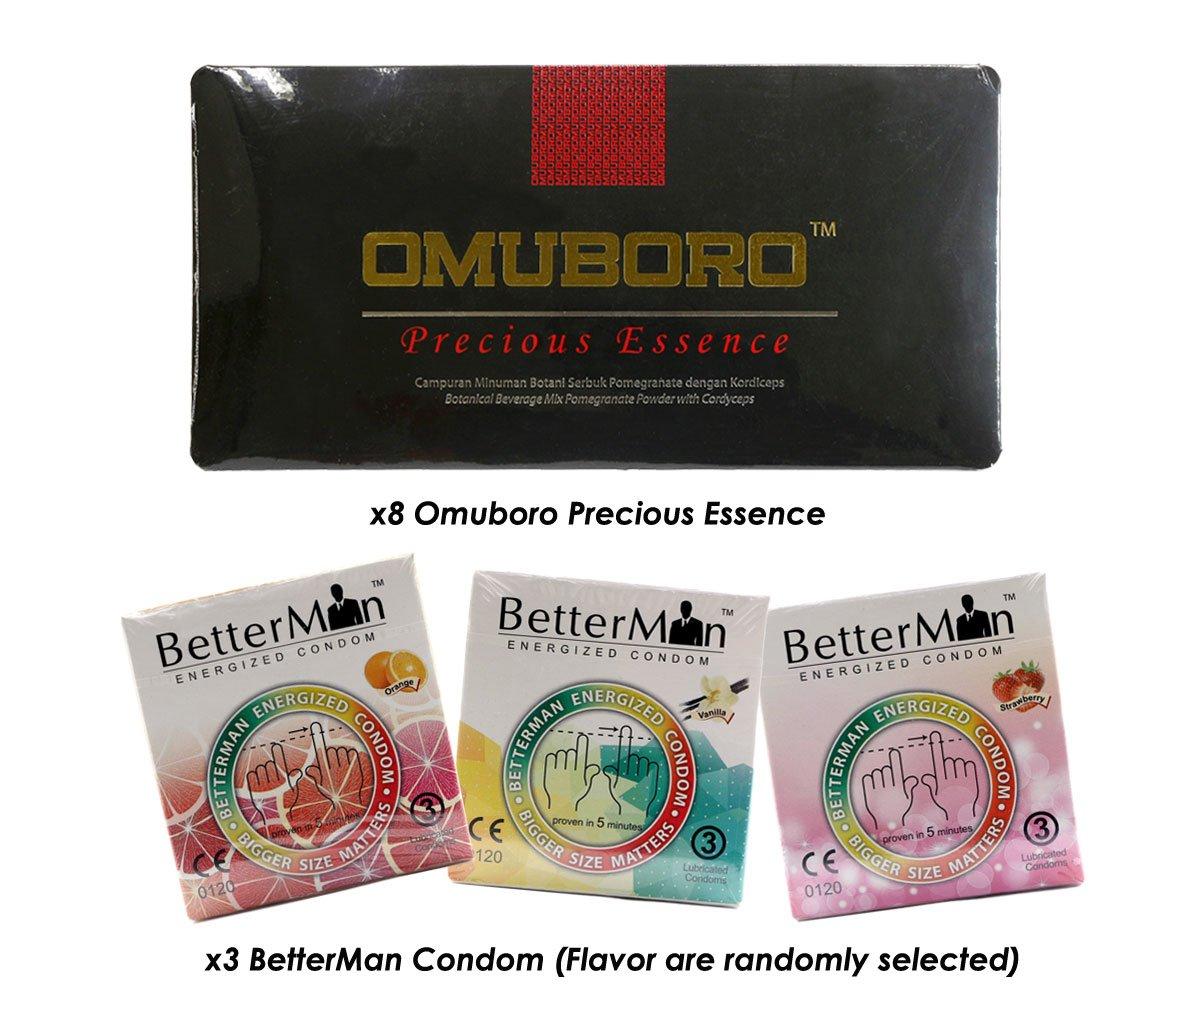 (8) Pack Omuboro Precious Essence Improve Erectile Function Strengthen Penis + Free (3) Box BetterMan Energized Ion Condom